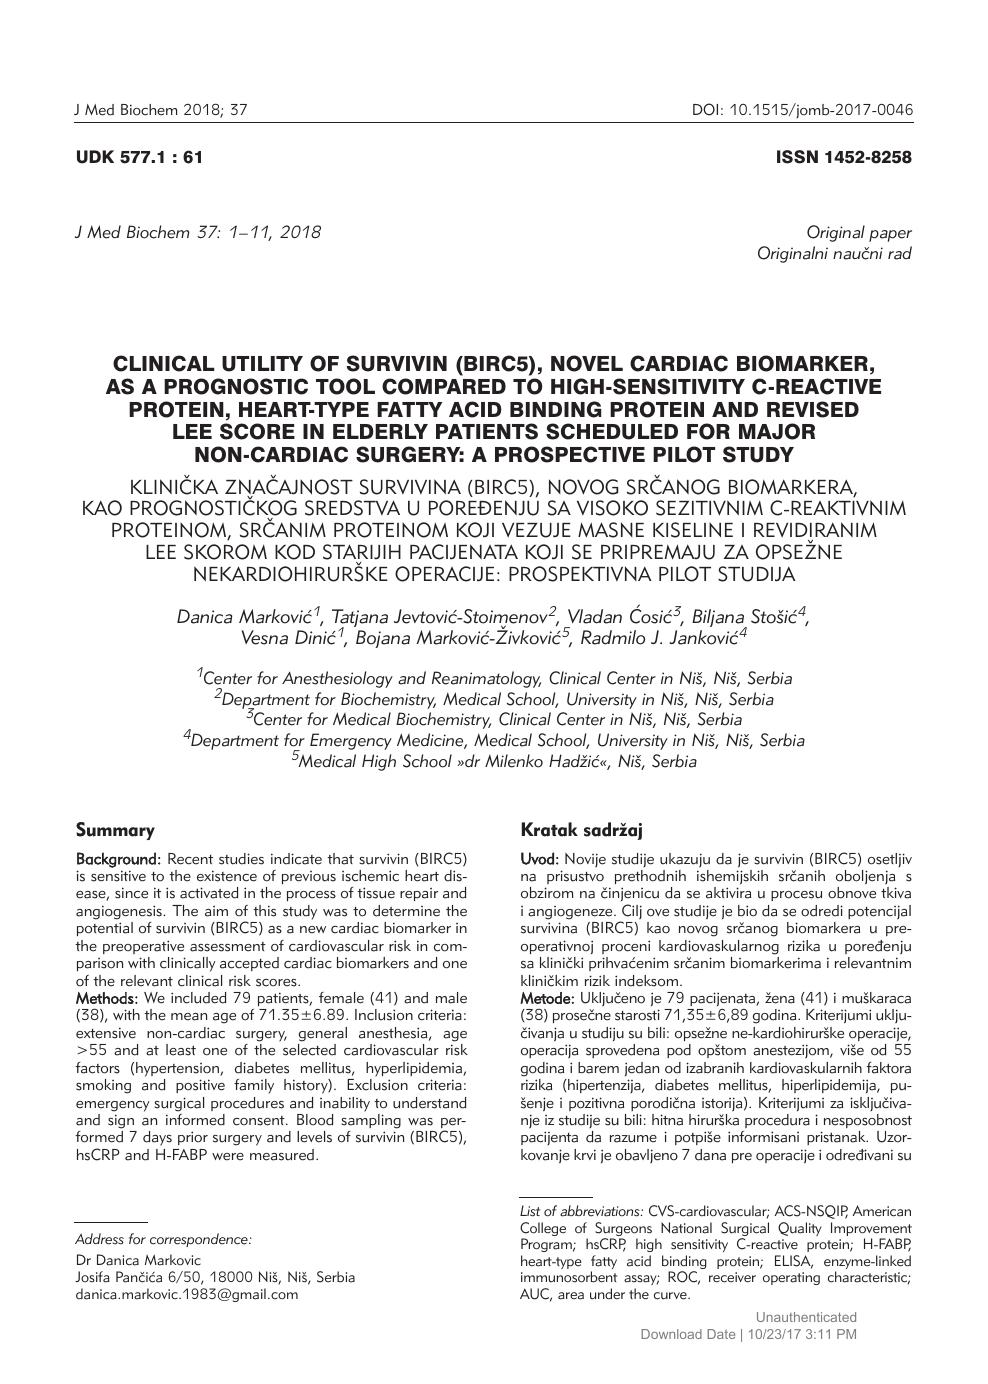 Clinical Utility of Survivin (BIRC5), Novel Cardiac